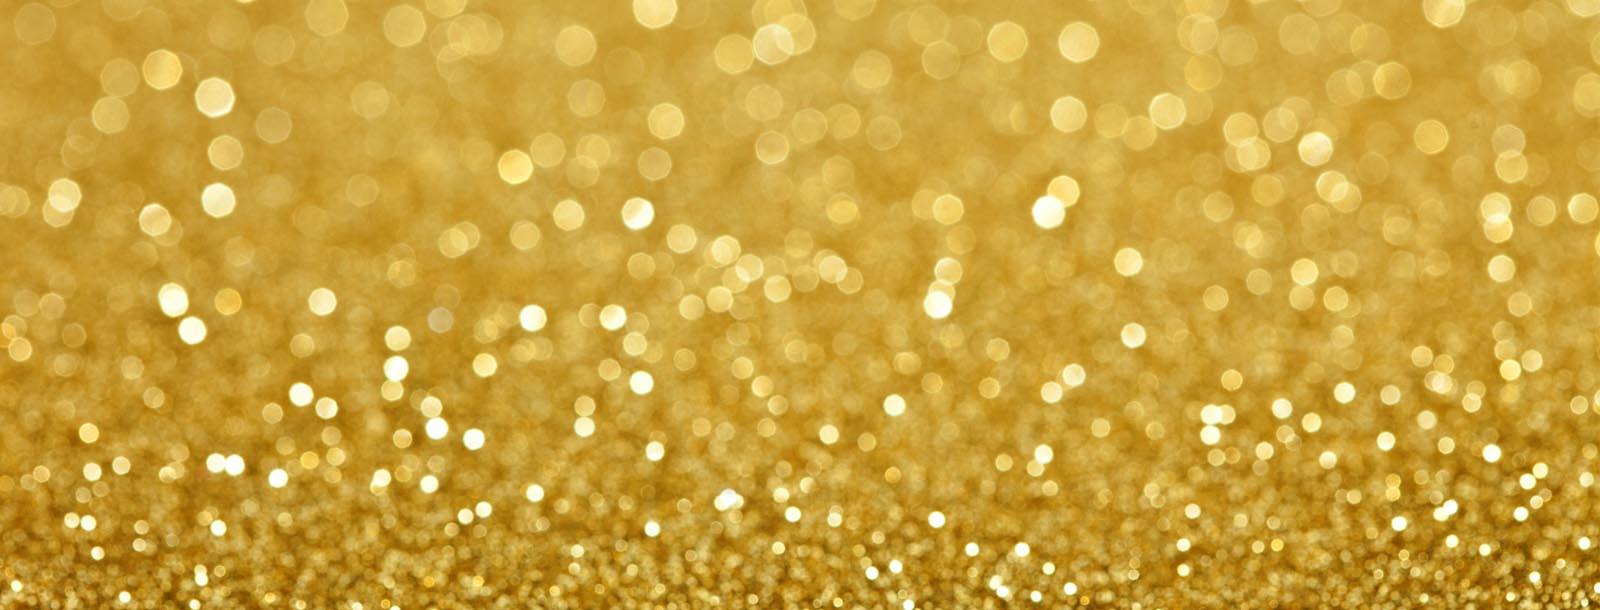 gold_glitter_background